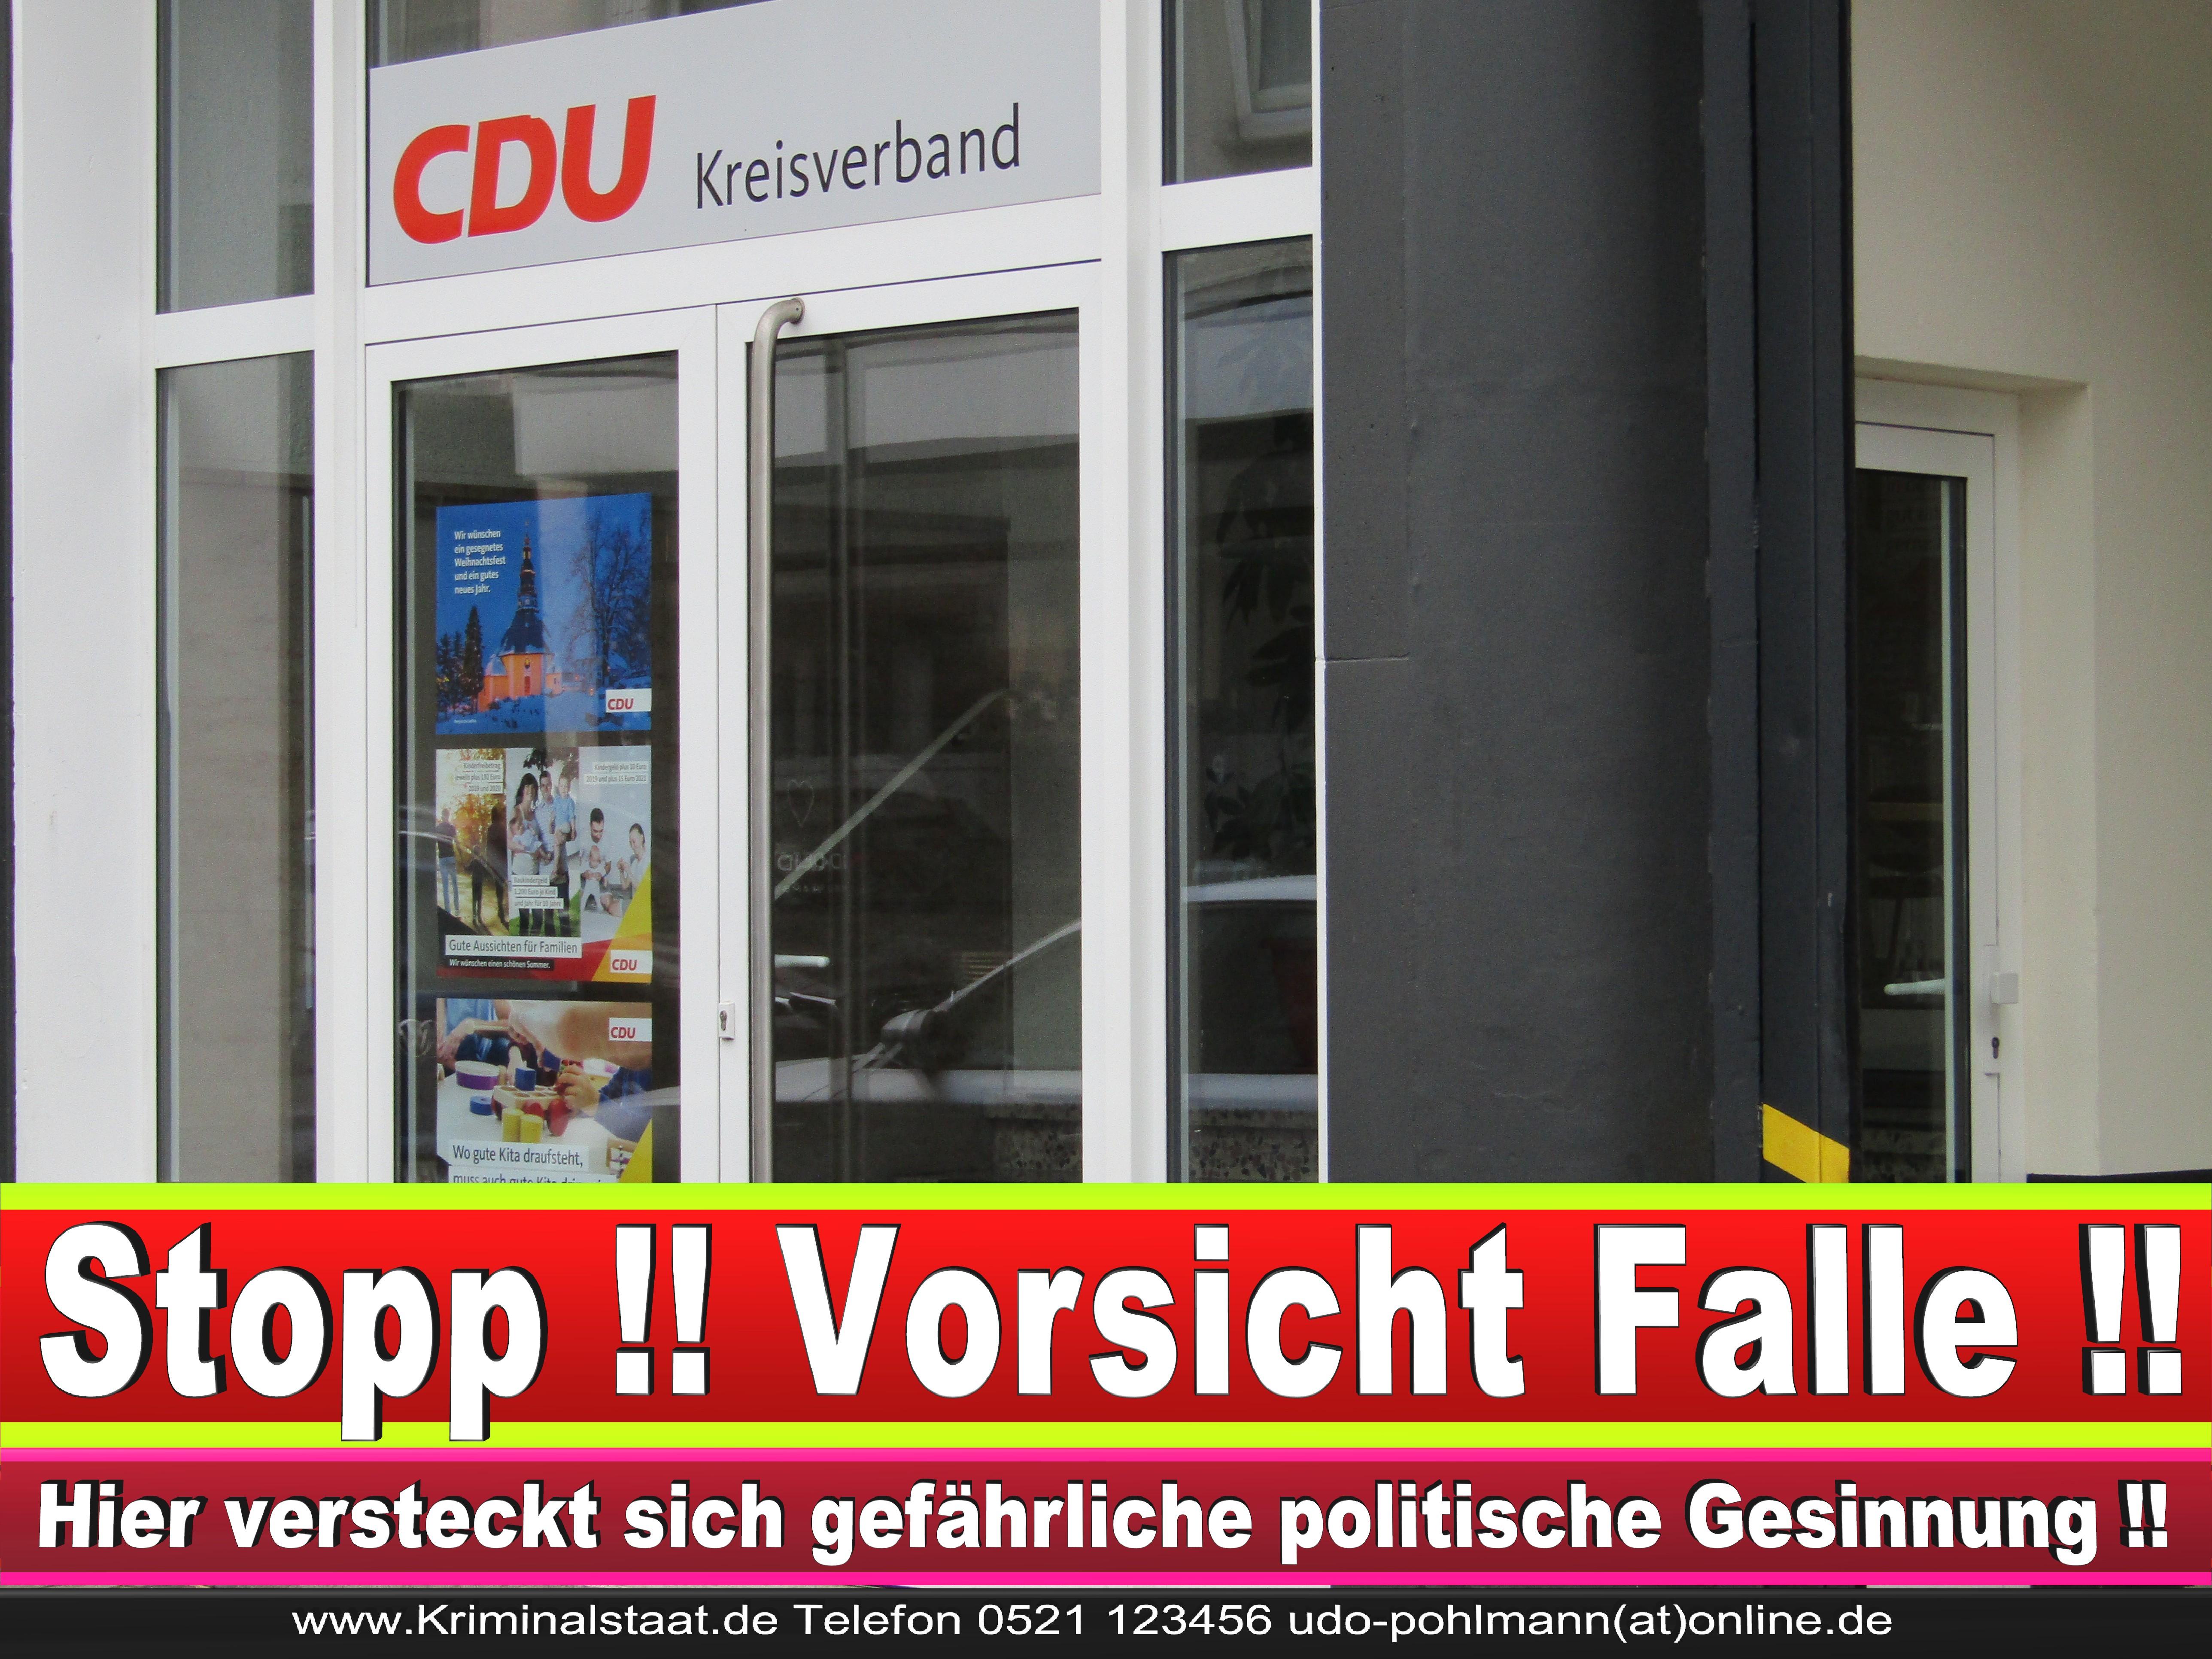 CDU DORTMUND KREISVERBAND BüRGERBüRO CDU FRAKTION ORTSVERBAND CDU NRW GESCHäFTSSTELLE ADRESSE RATSMITGLIEDER CDU (28) 1